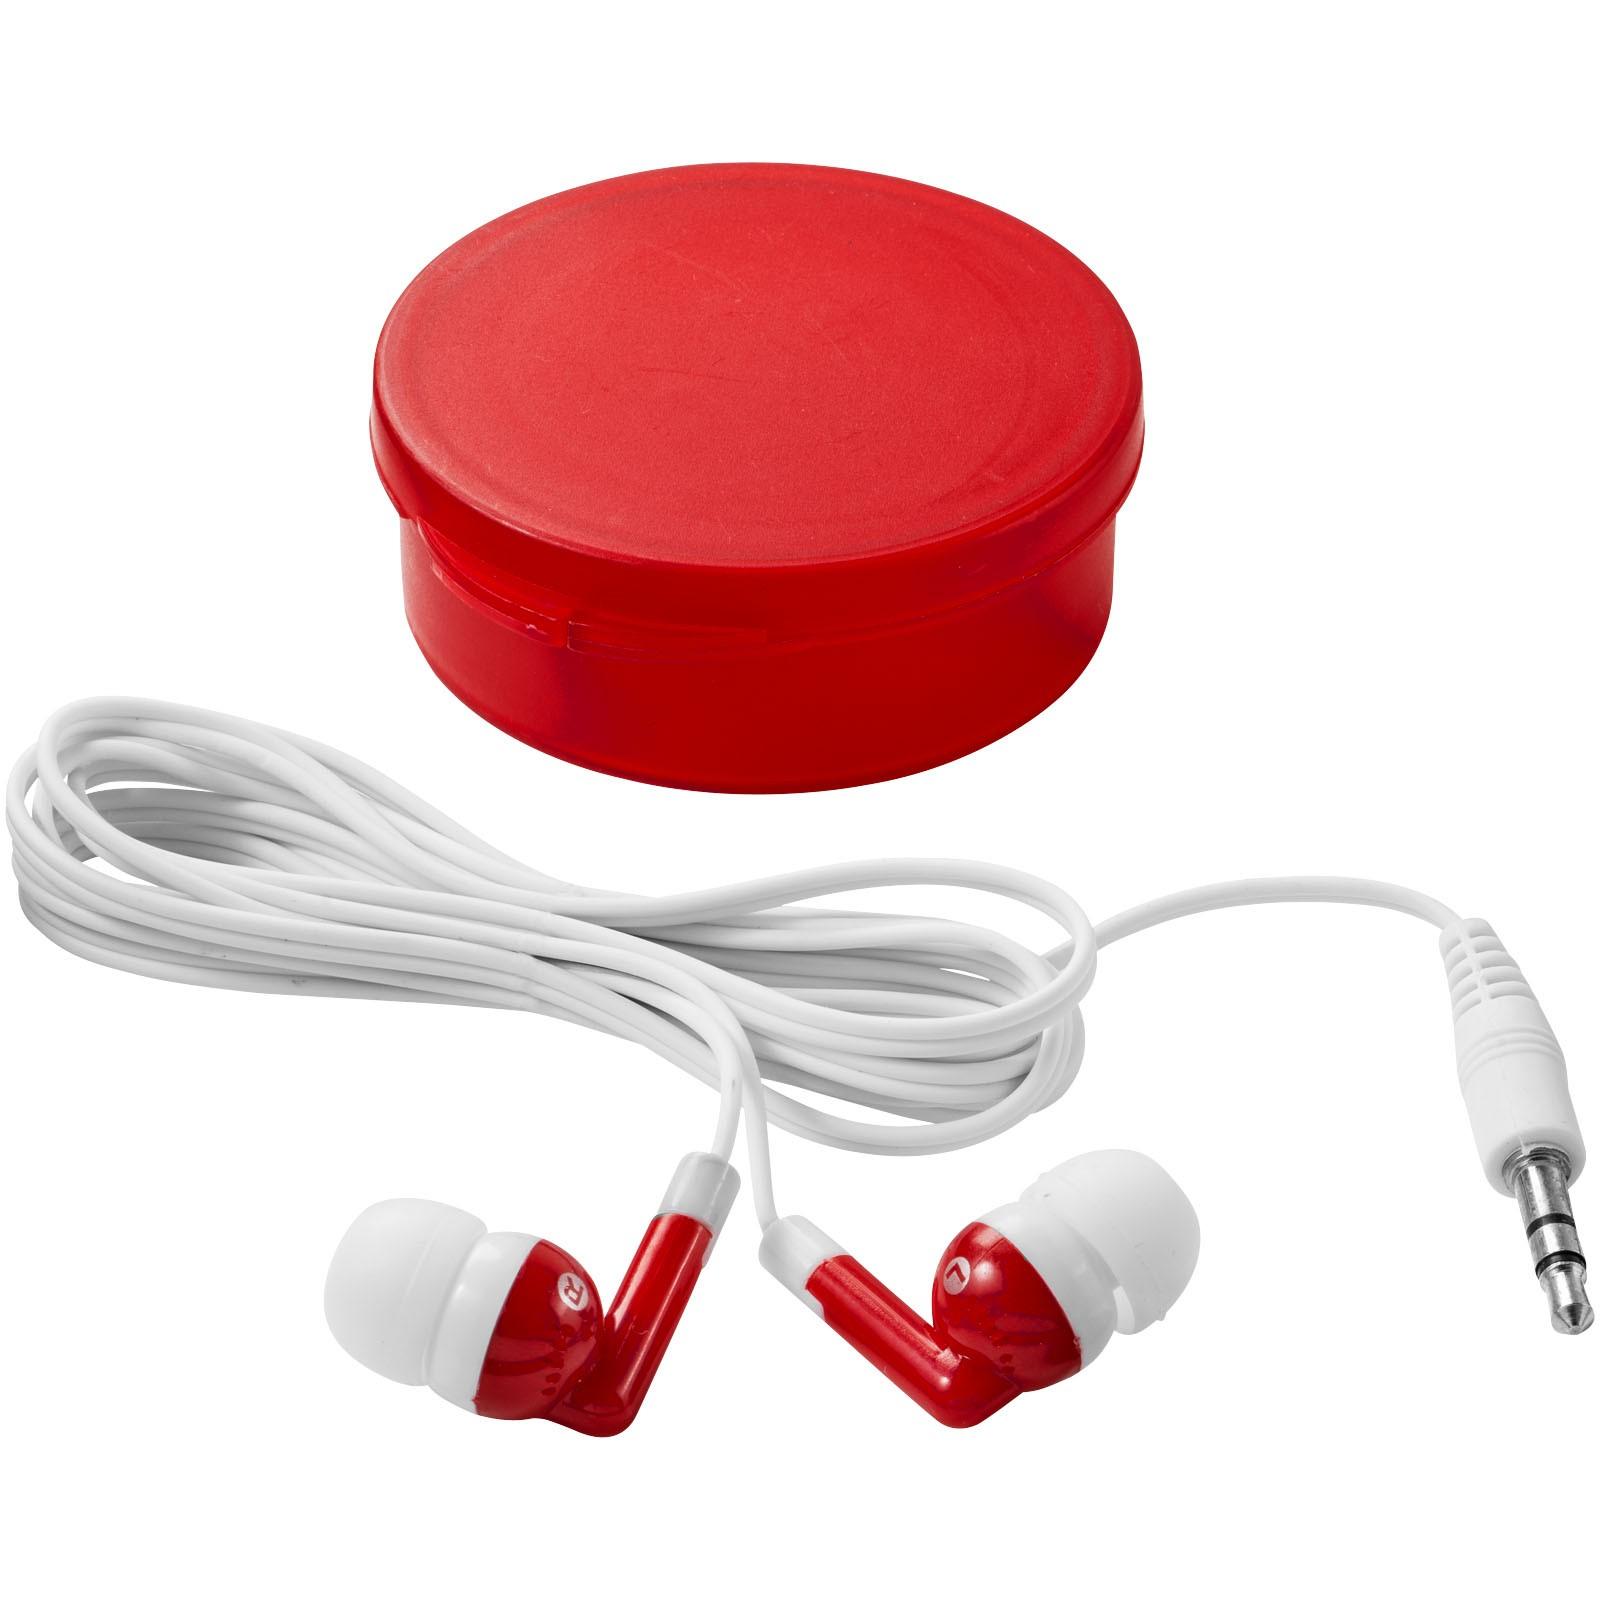 Sluchátka Versa - Transparentní červená / Bílá